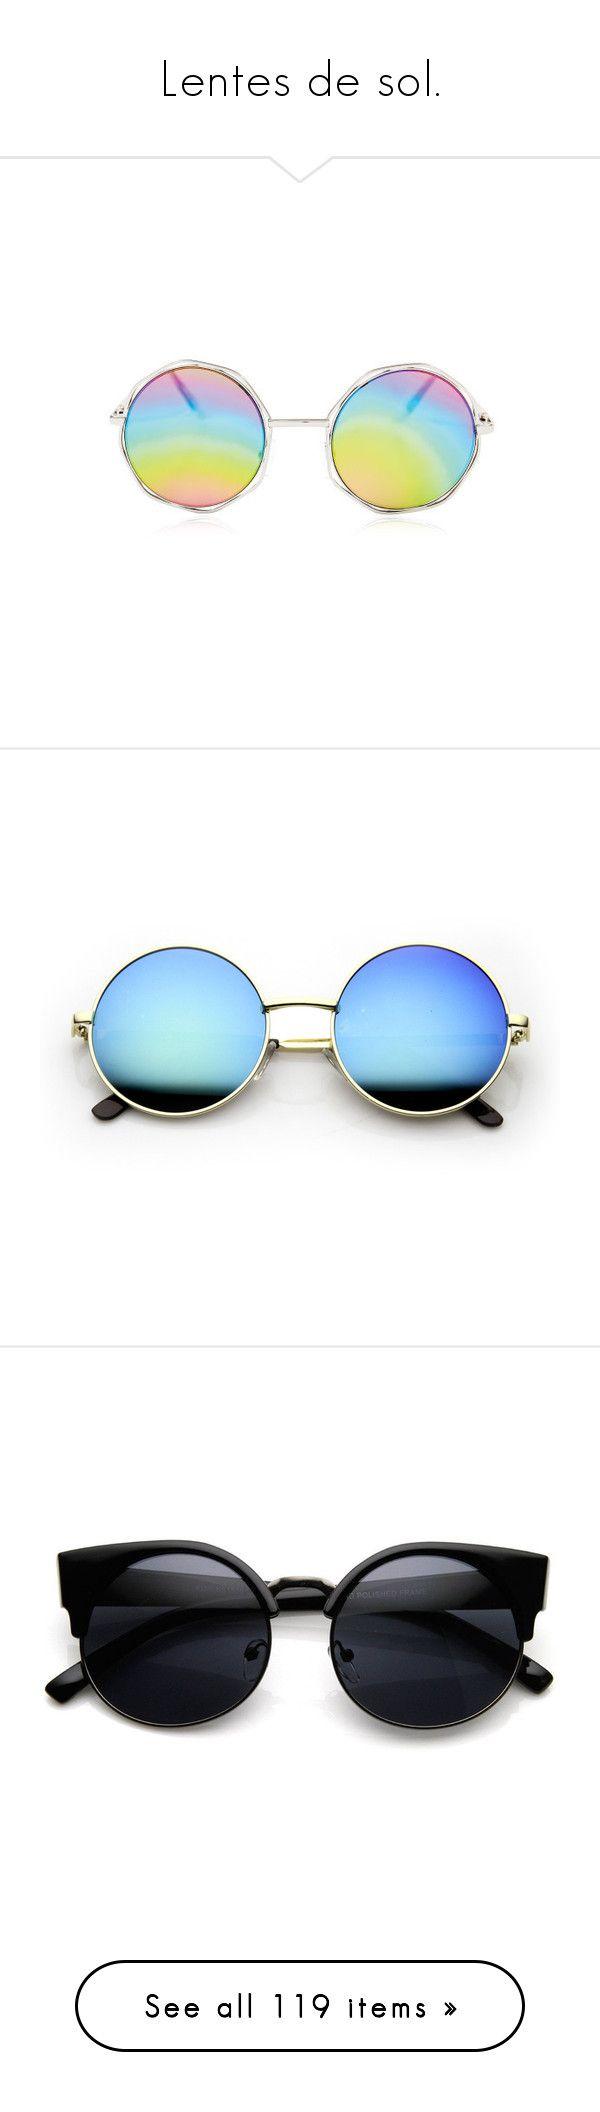 """Lentes de sol."" by allofmeallofme on Polyvore featuring accessories, eyewear, sunglasses, glasses, jewelry, rainbow sunglasses, circular sunglasses, circle sunglasses, rainbow glasses y snap glasses"